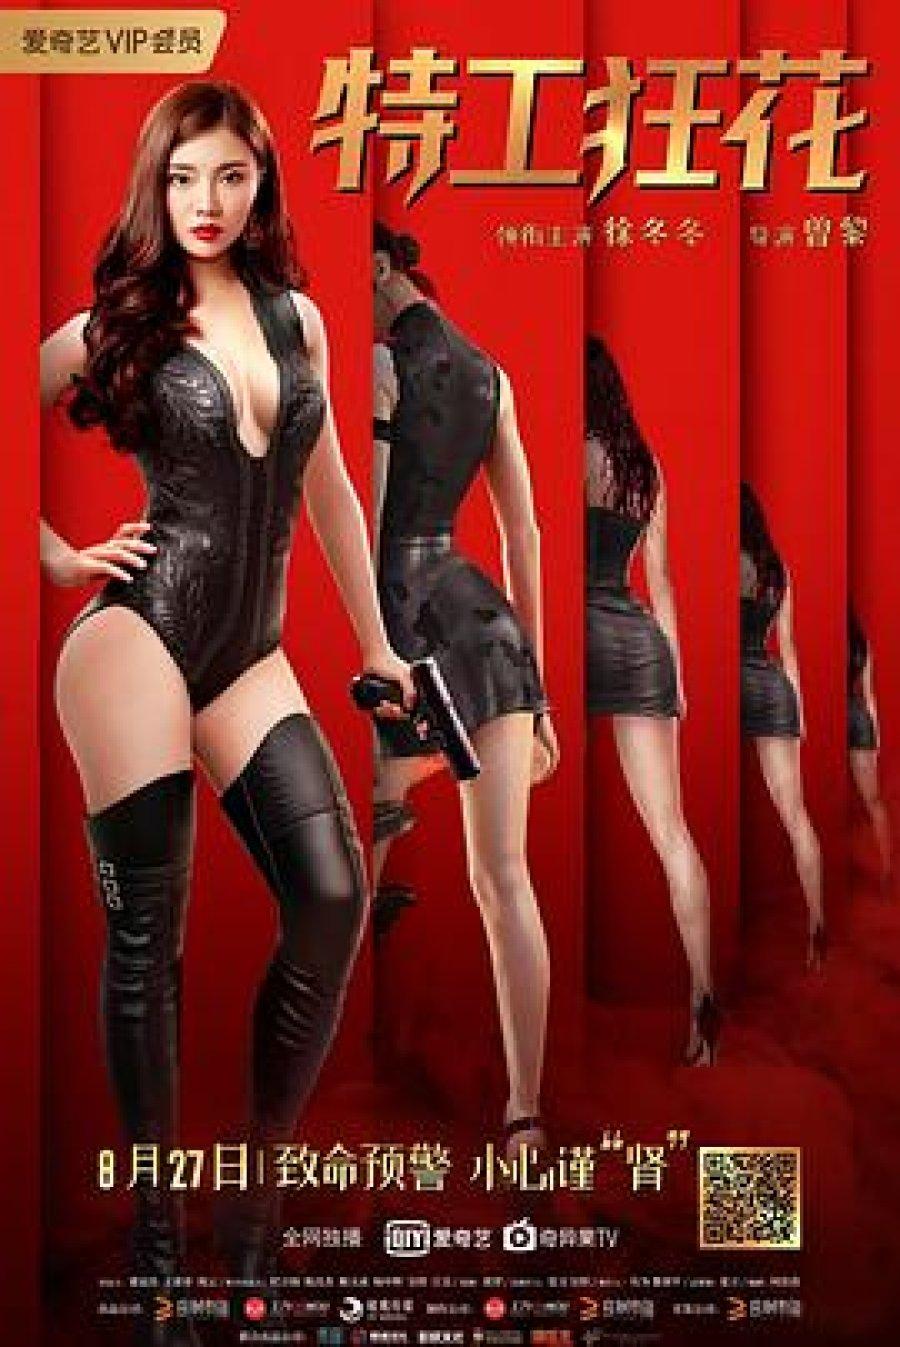 Miss Agent | 特工狂花 |